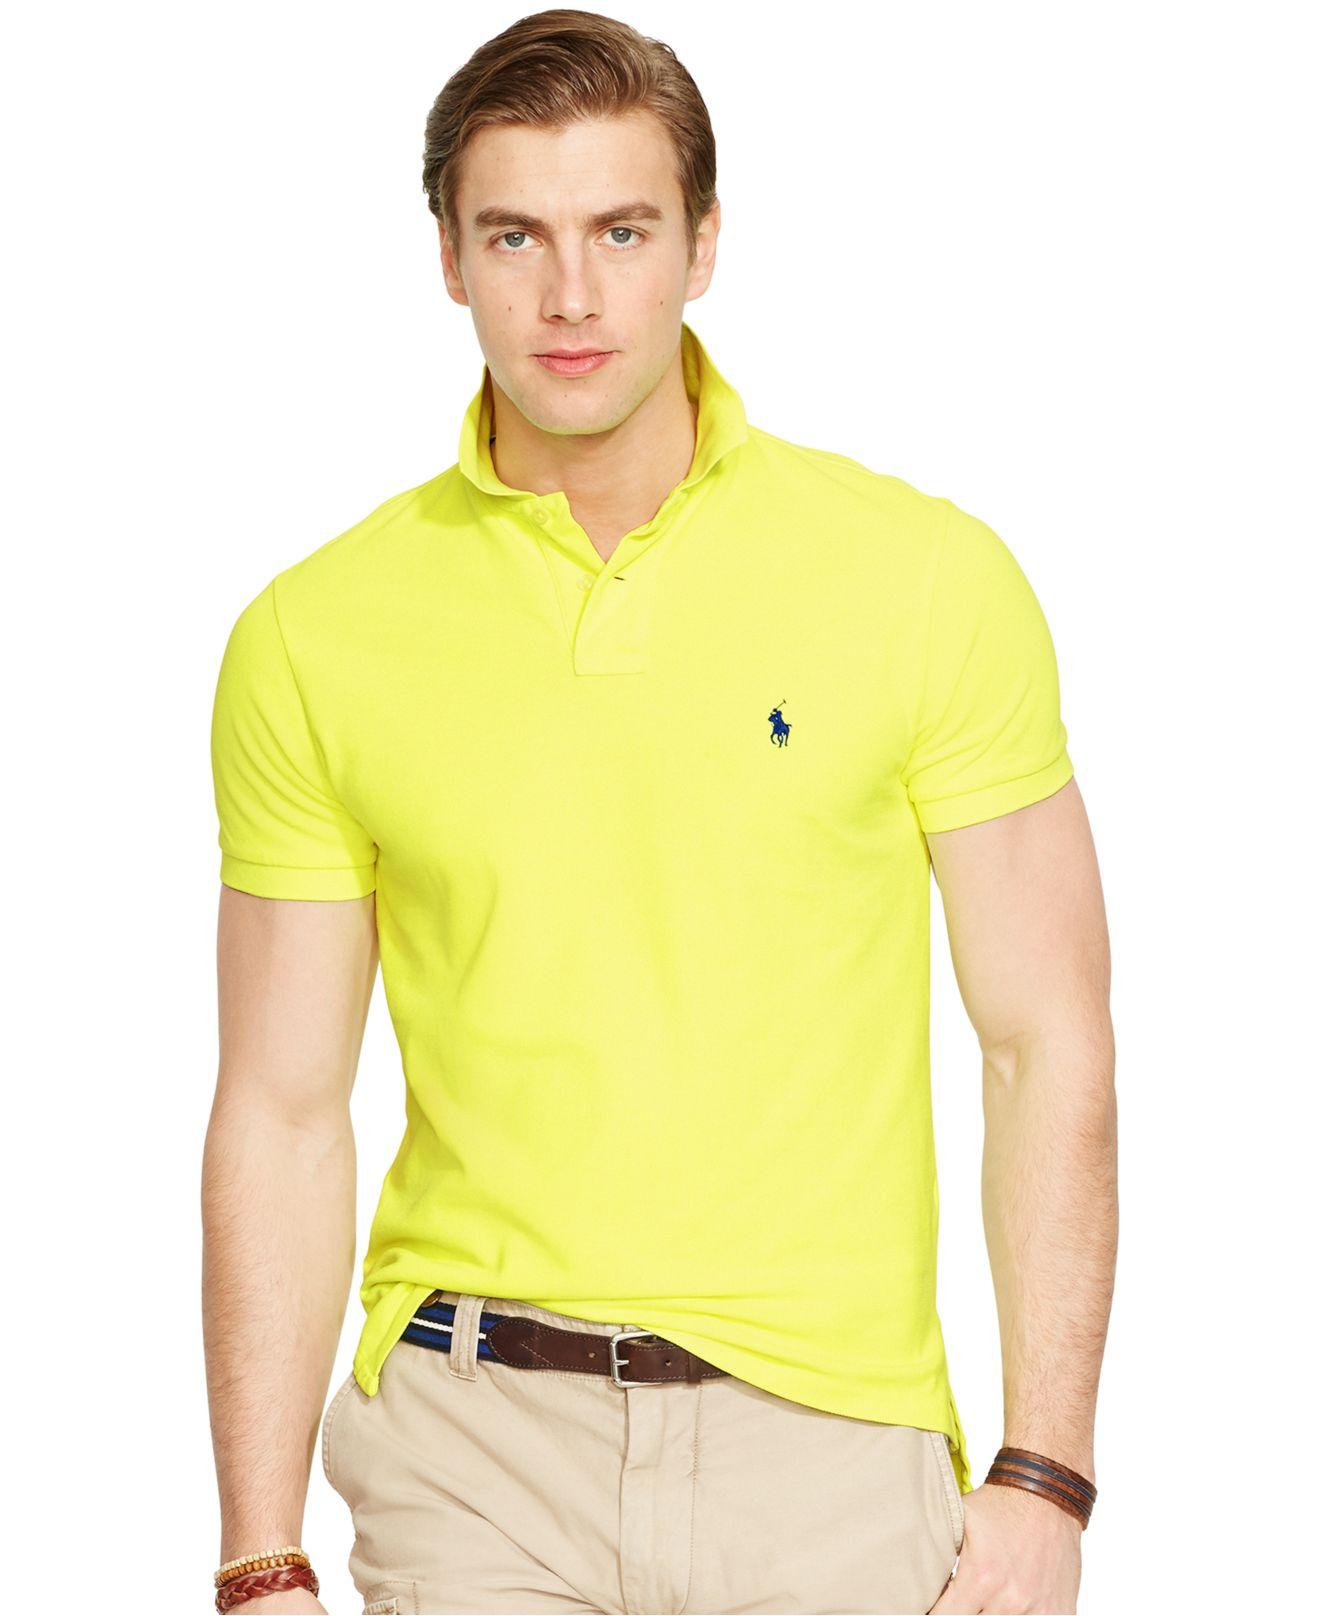 324f0dc8 reduced bright yellow ralph lauren polo shirt ac4a3 5d474